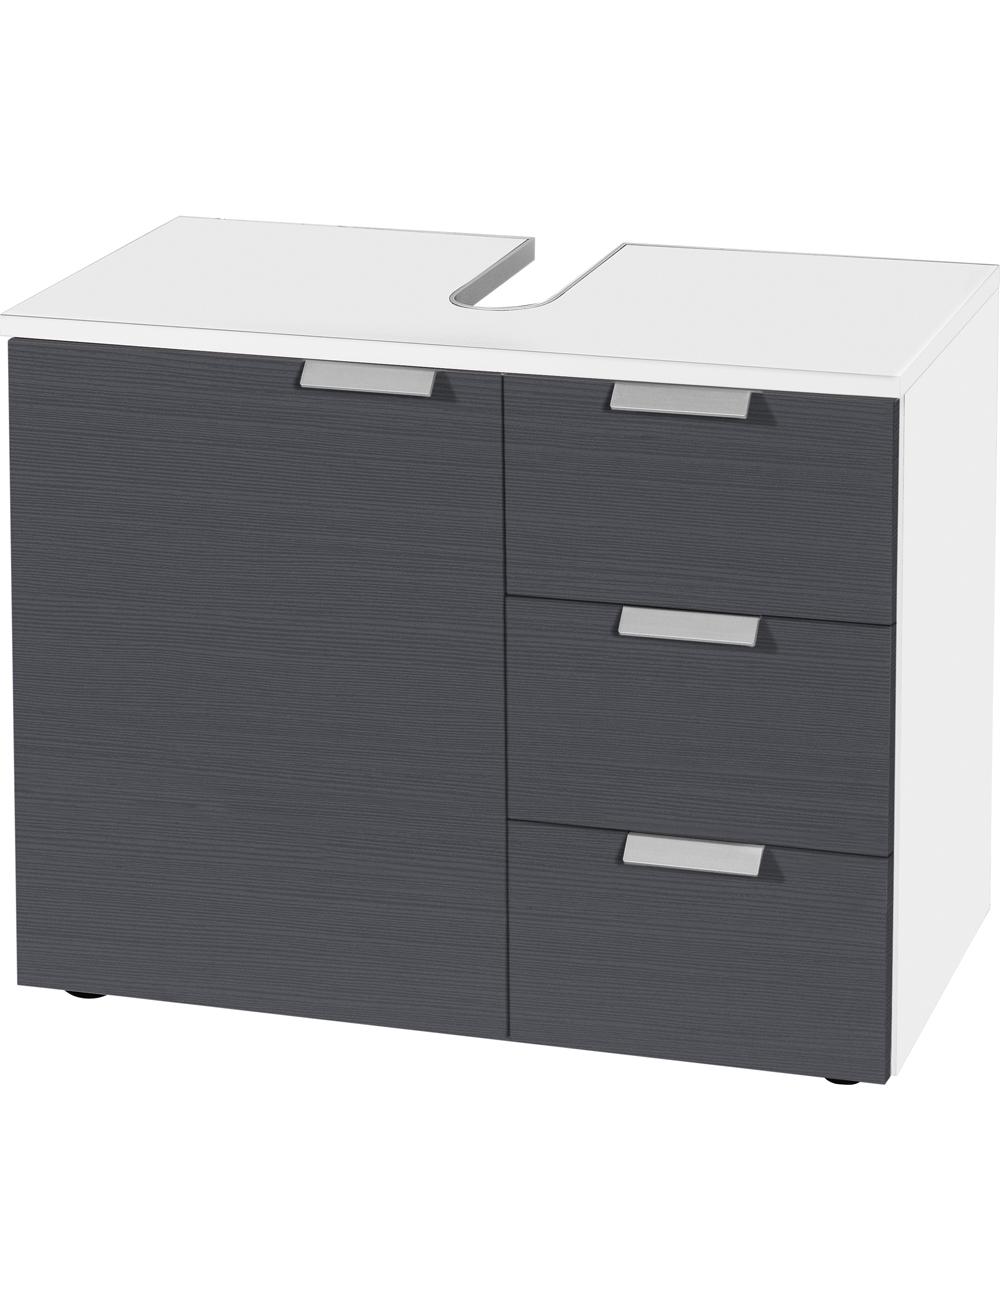 lavabo unterschrank swiss 2 grau. Black Bedroom Furniture Sets. Home Design Ideas